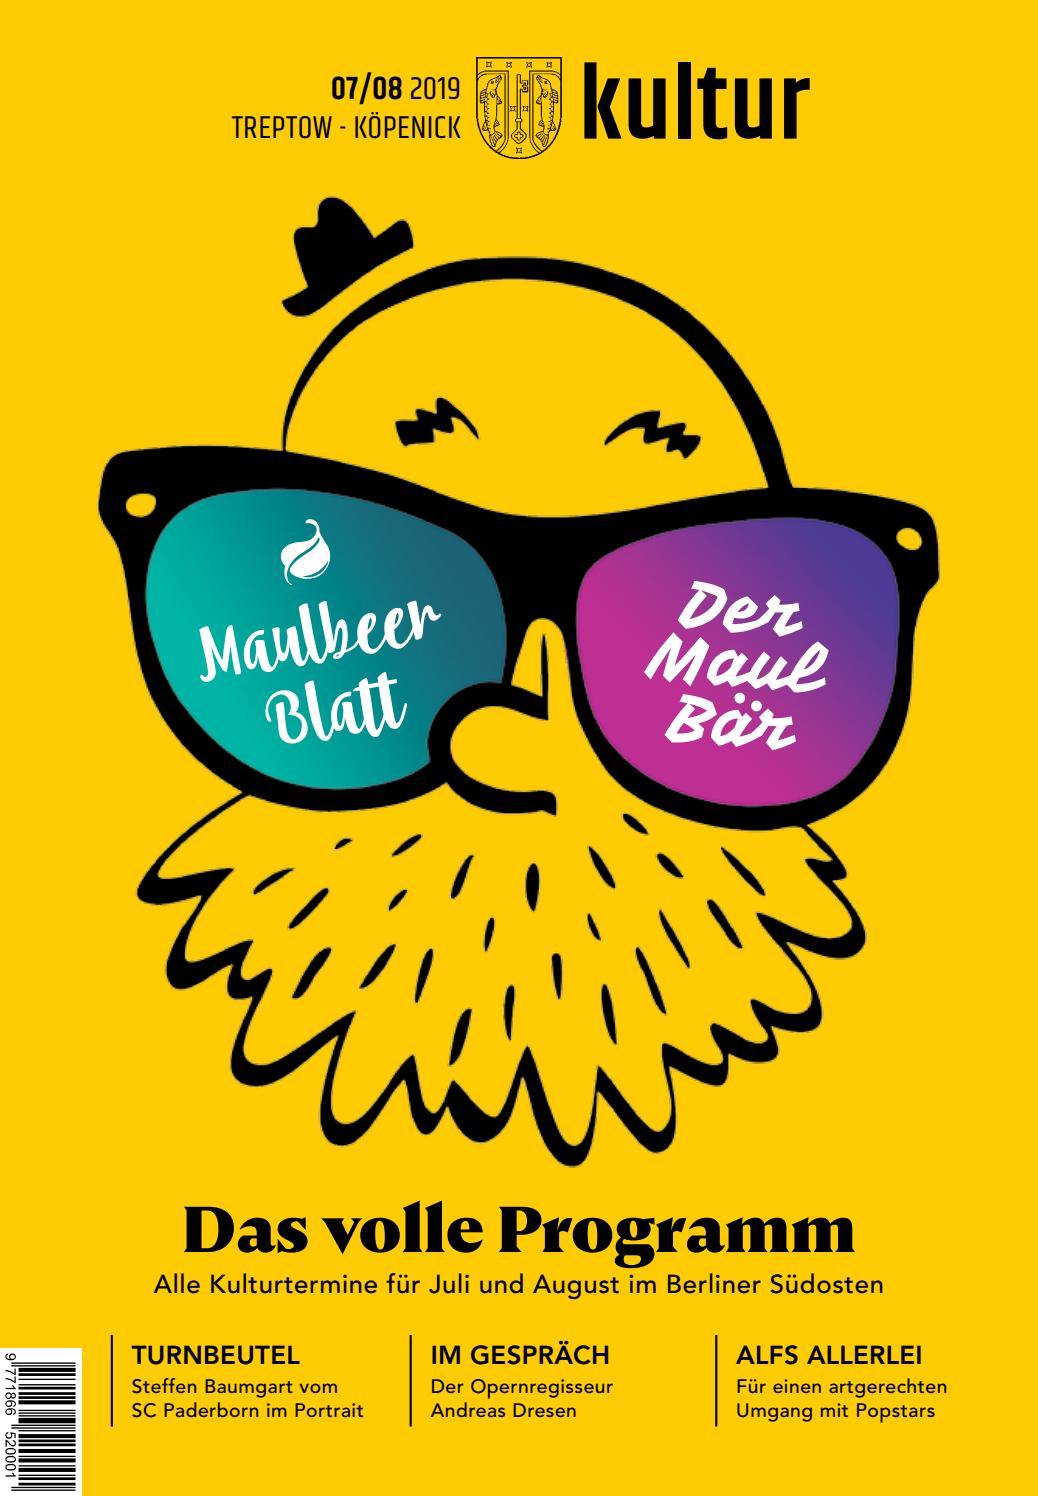 Maulbeerblatt #110 DER MAULBEER Kulturkalender 0708 by